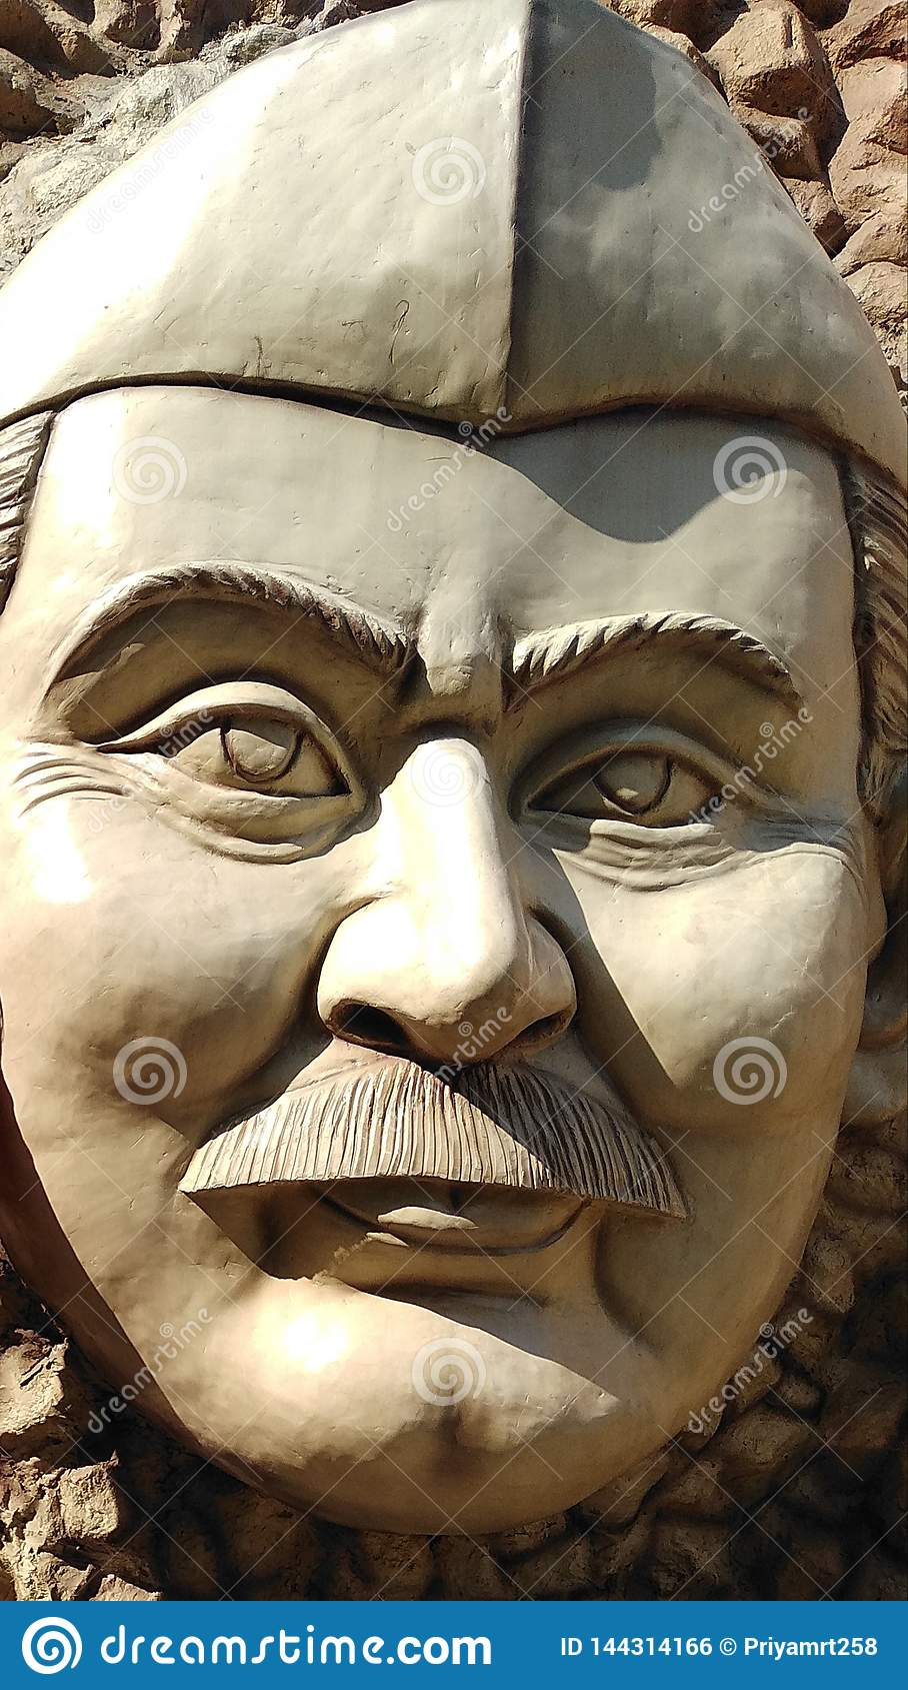 Standbeeld van Chaudhary Charan Singh